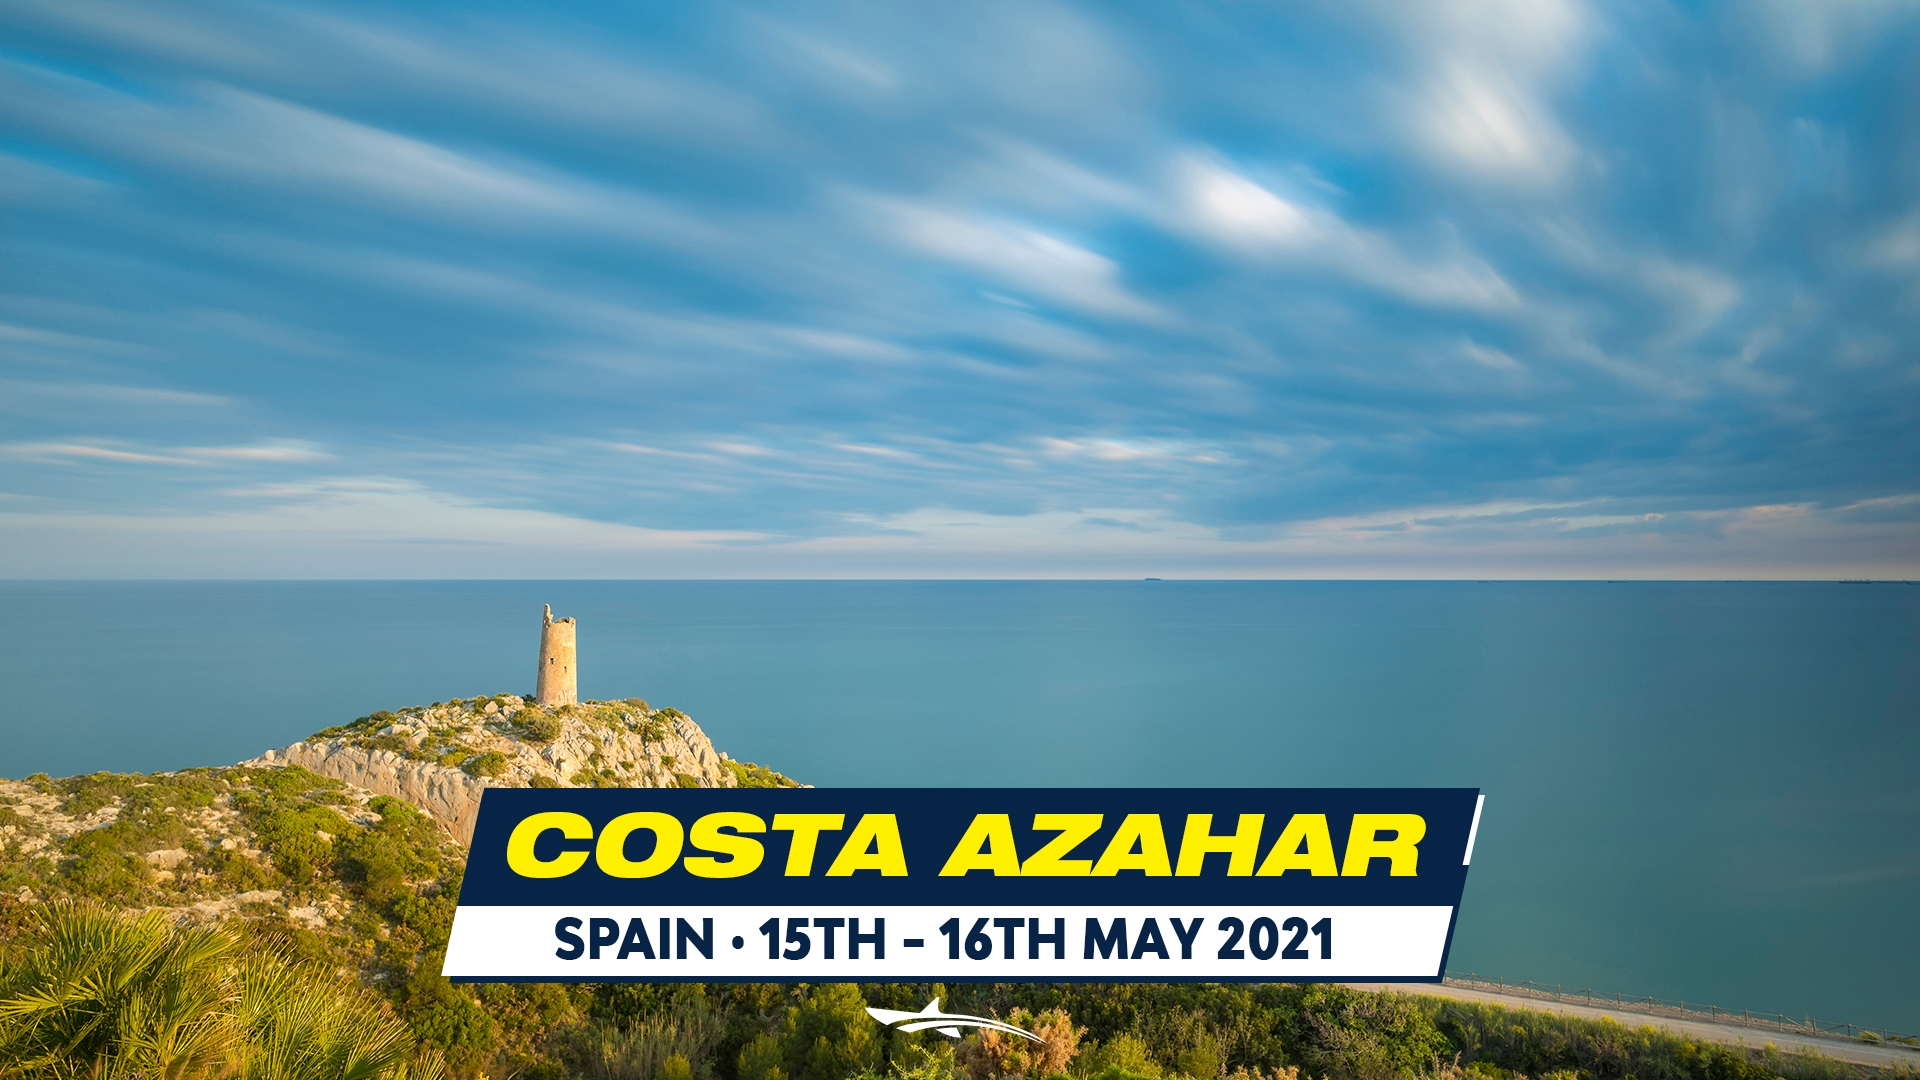 OCEANMAN COSTA AZAHAR SPAIN 2021